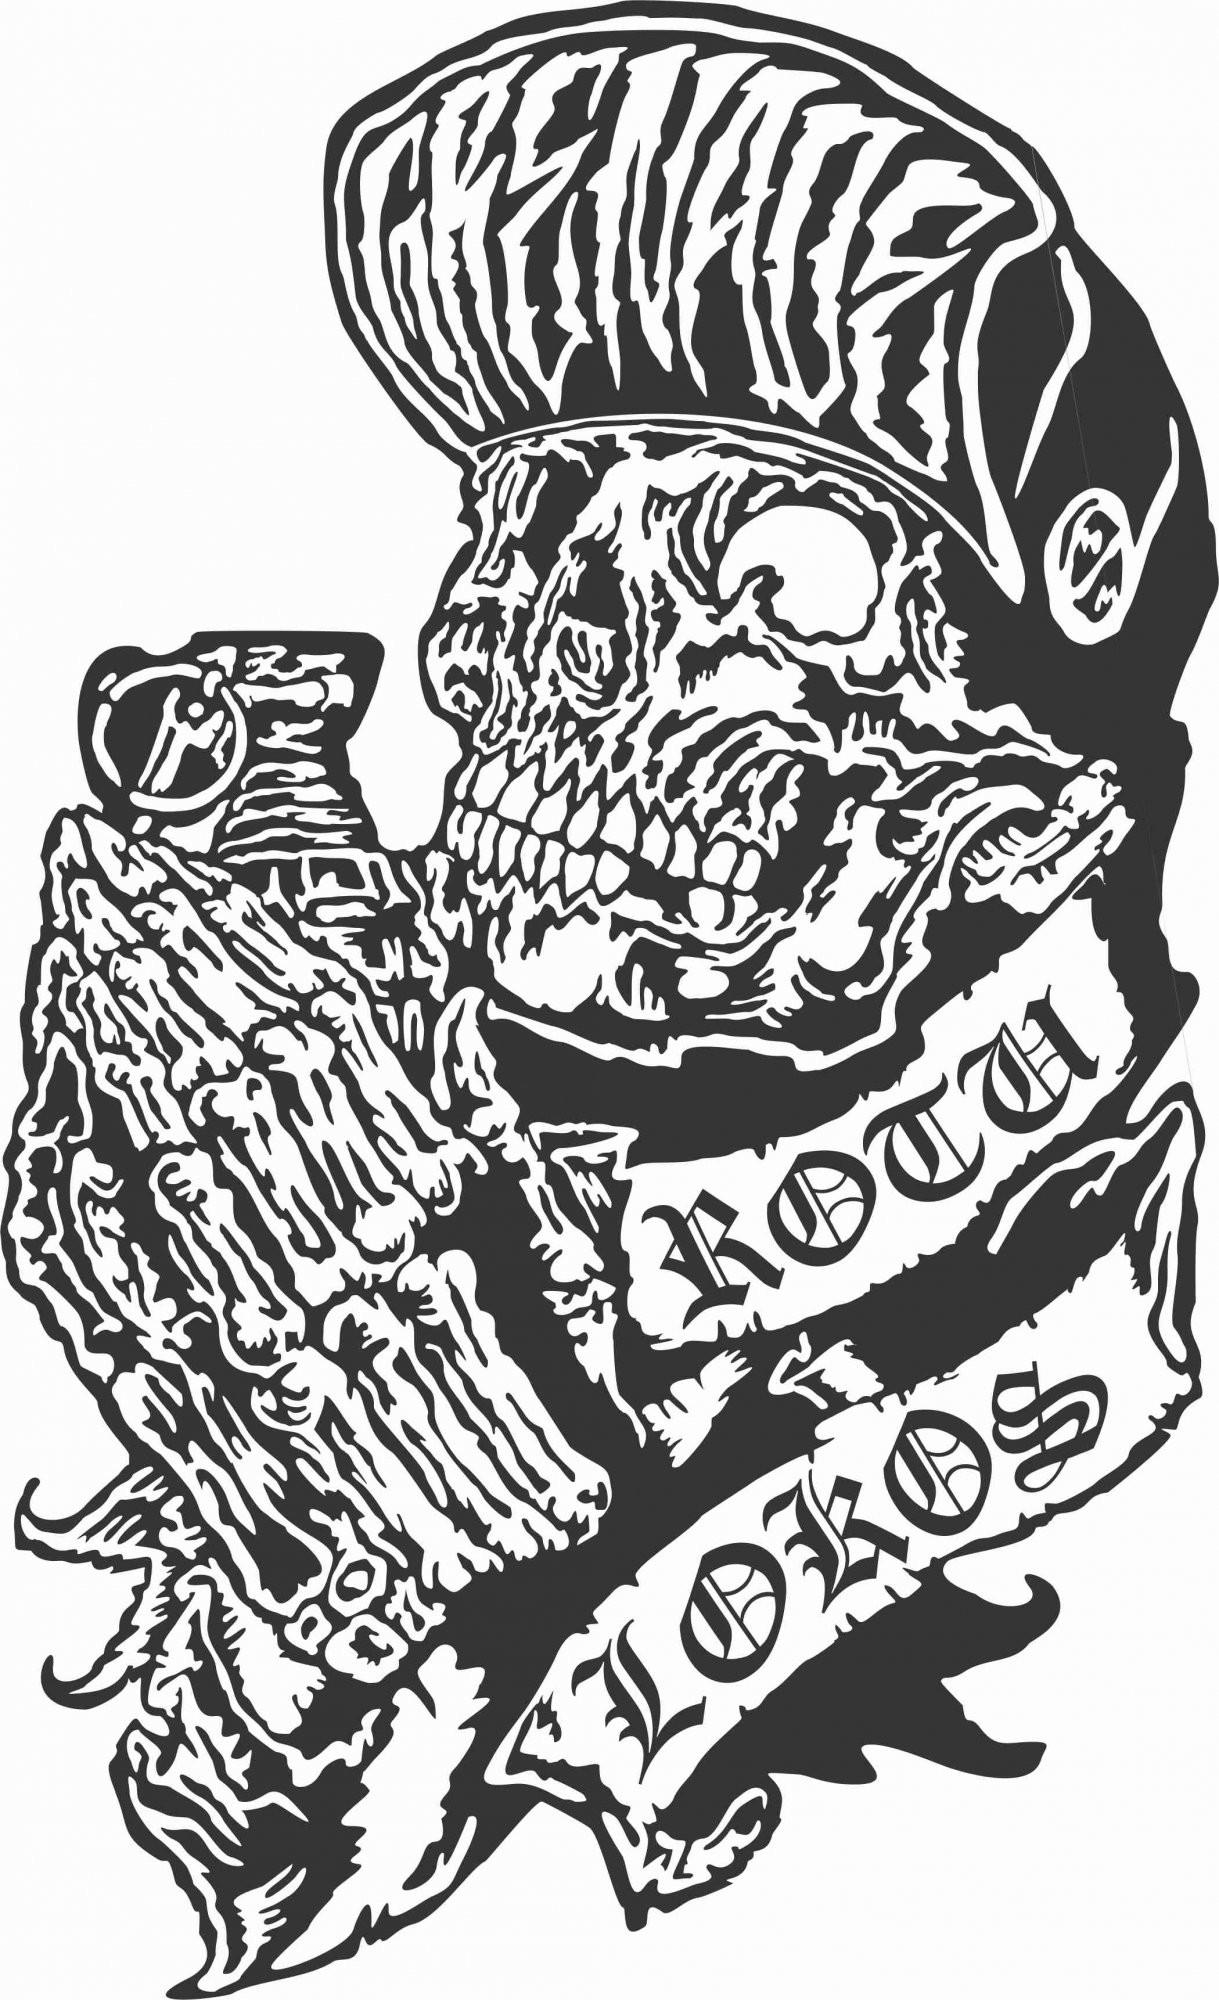 Awesome Metal Mulisha Logos